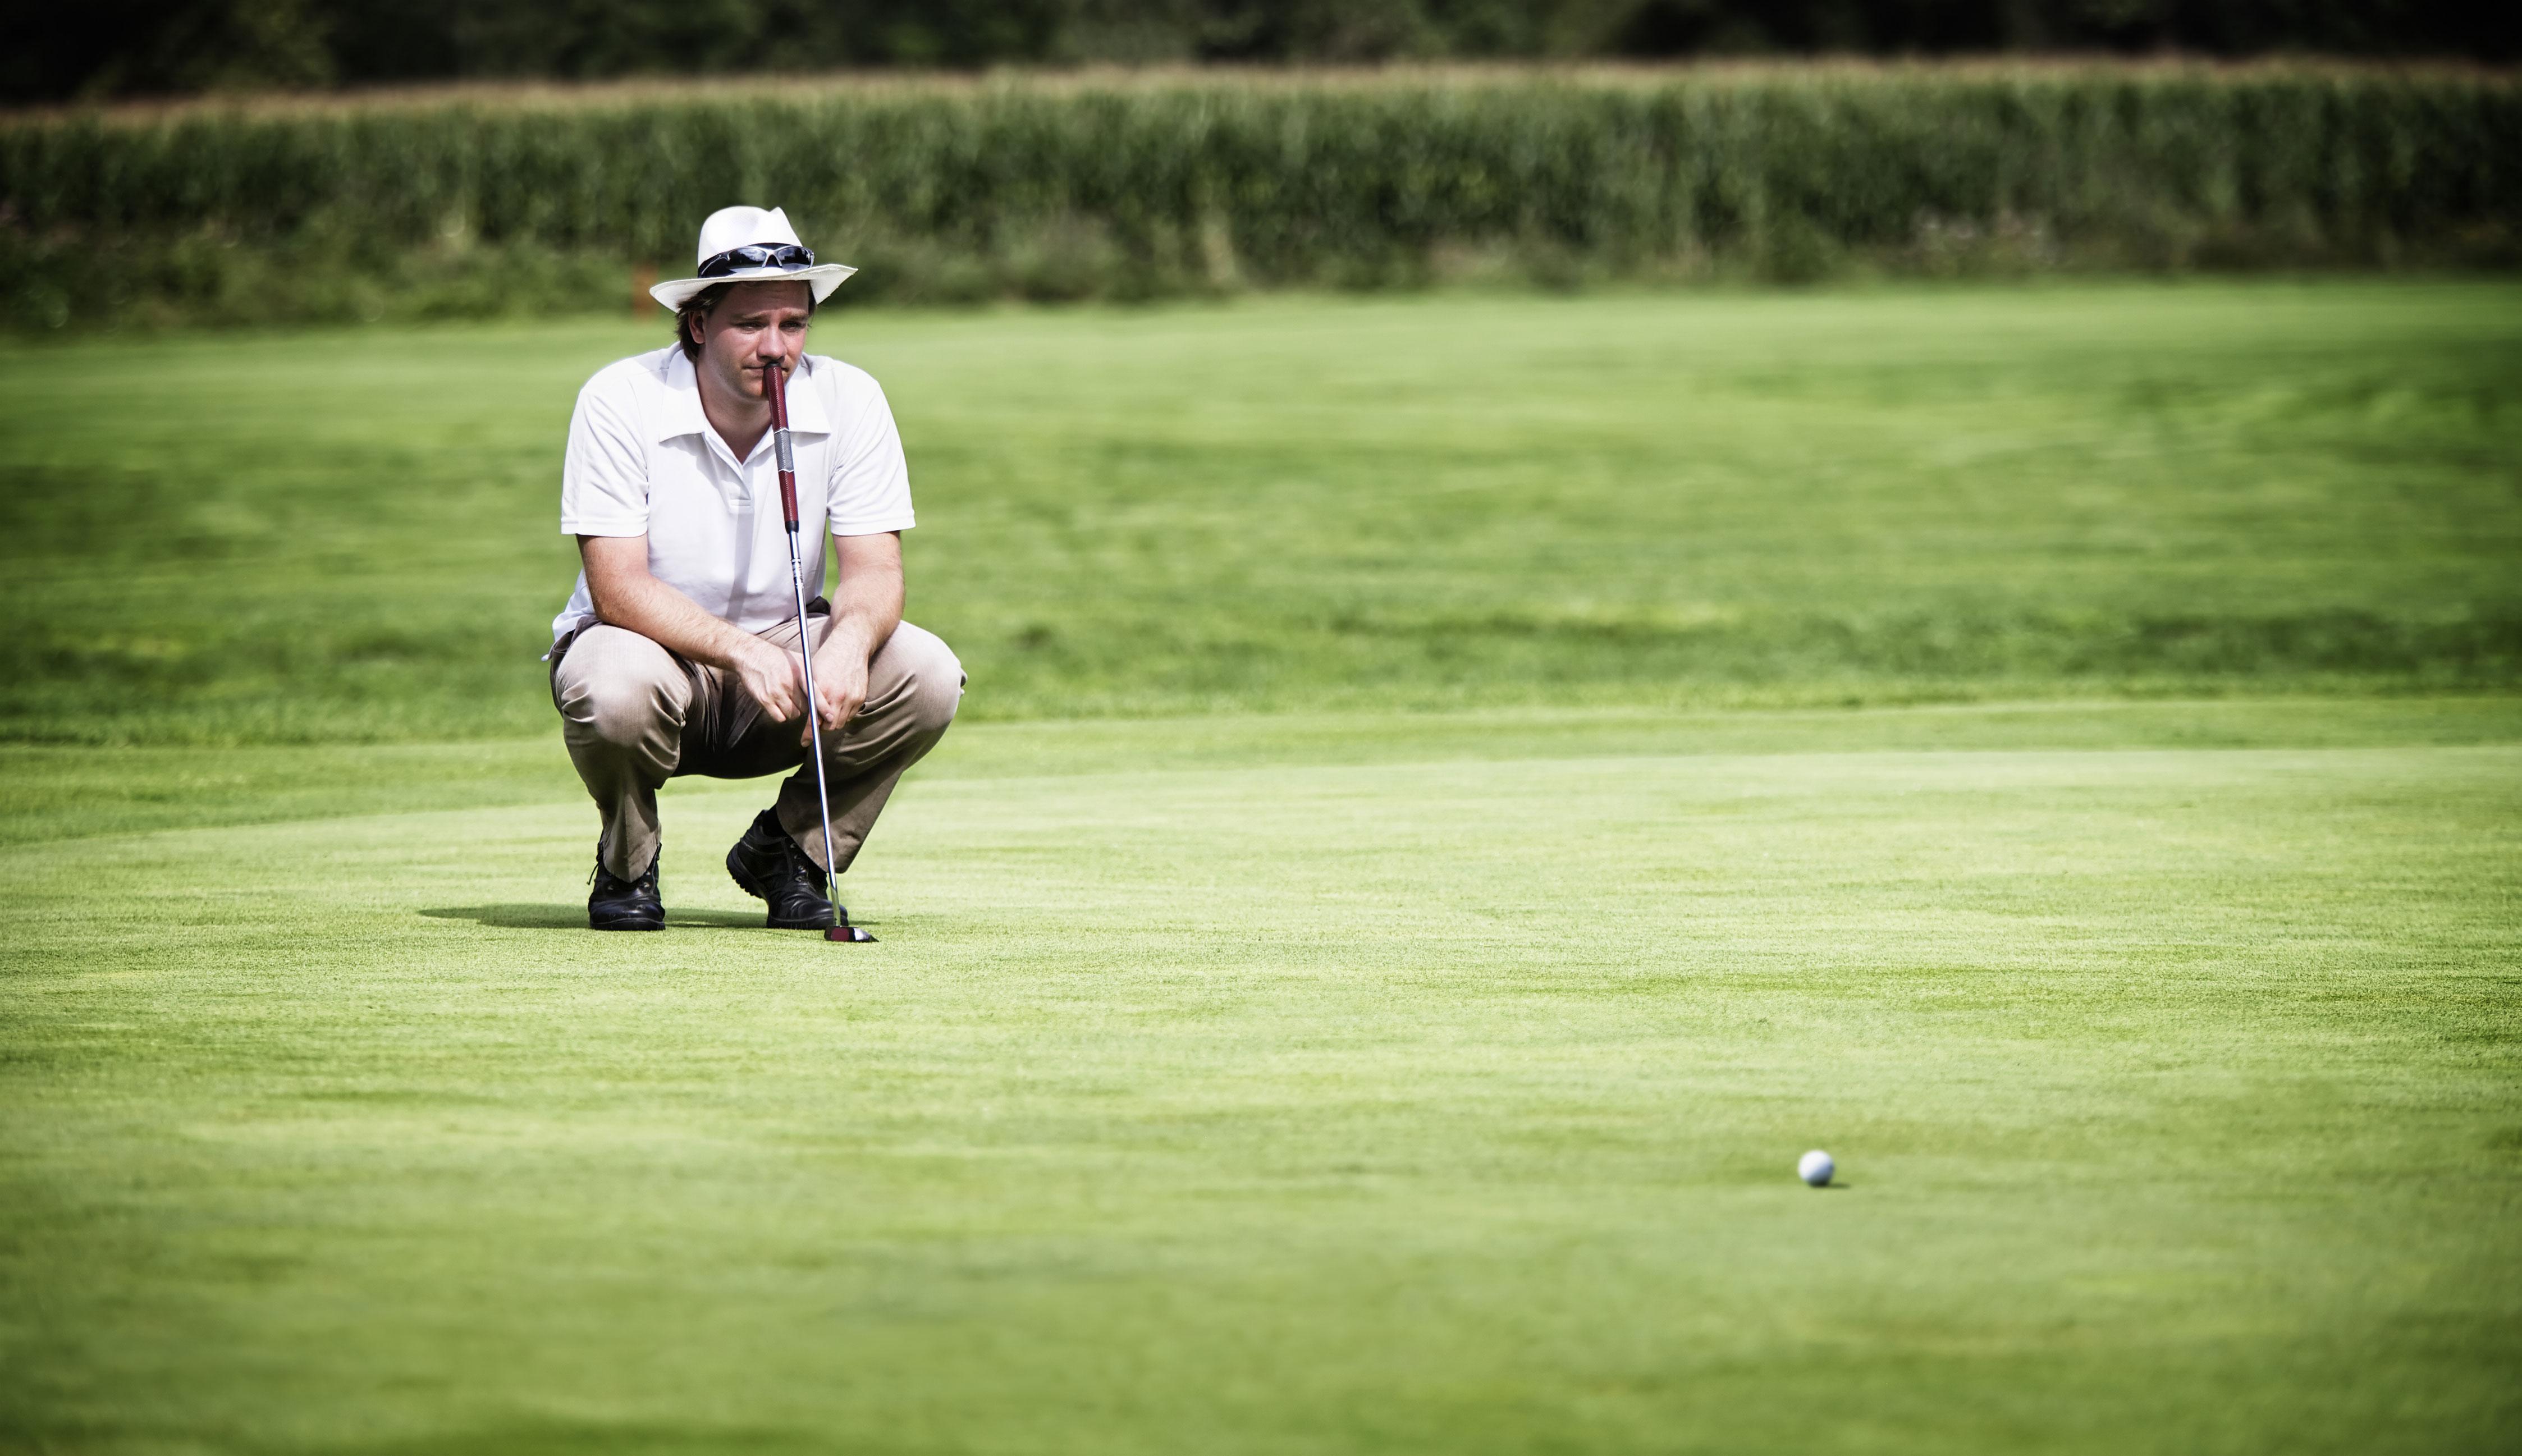 golf people essay